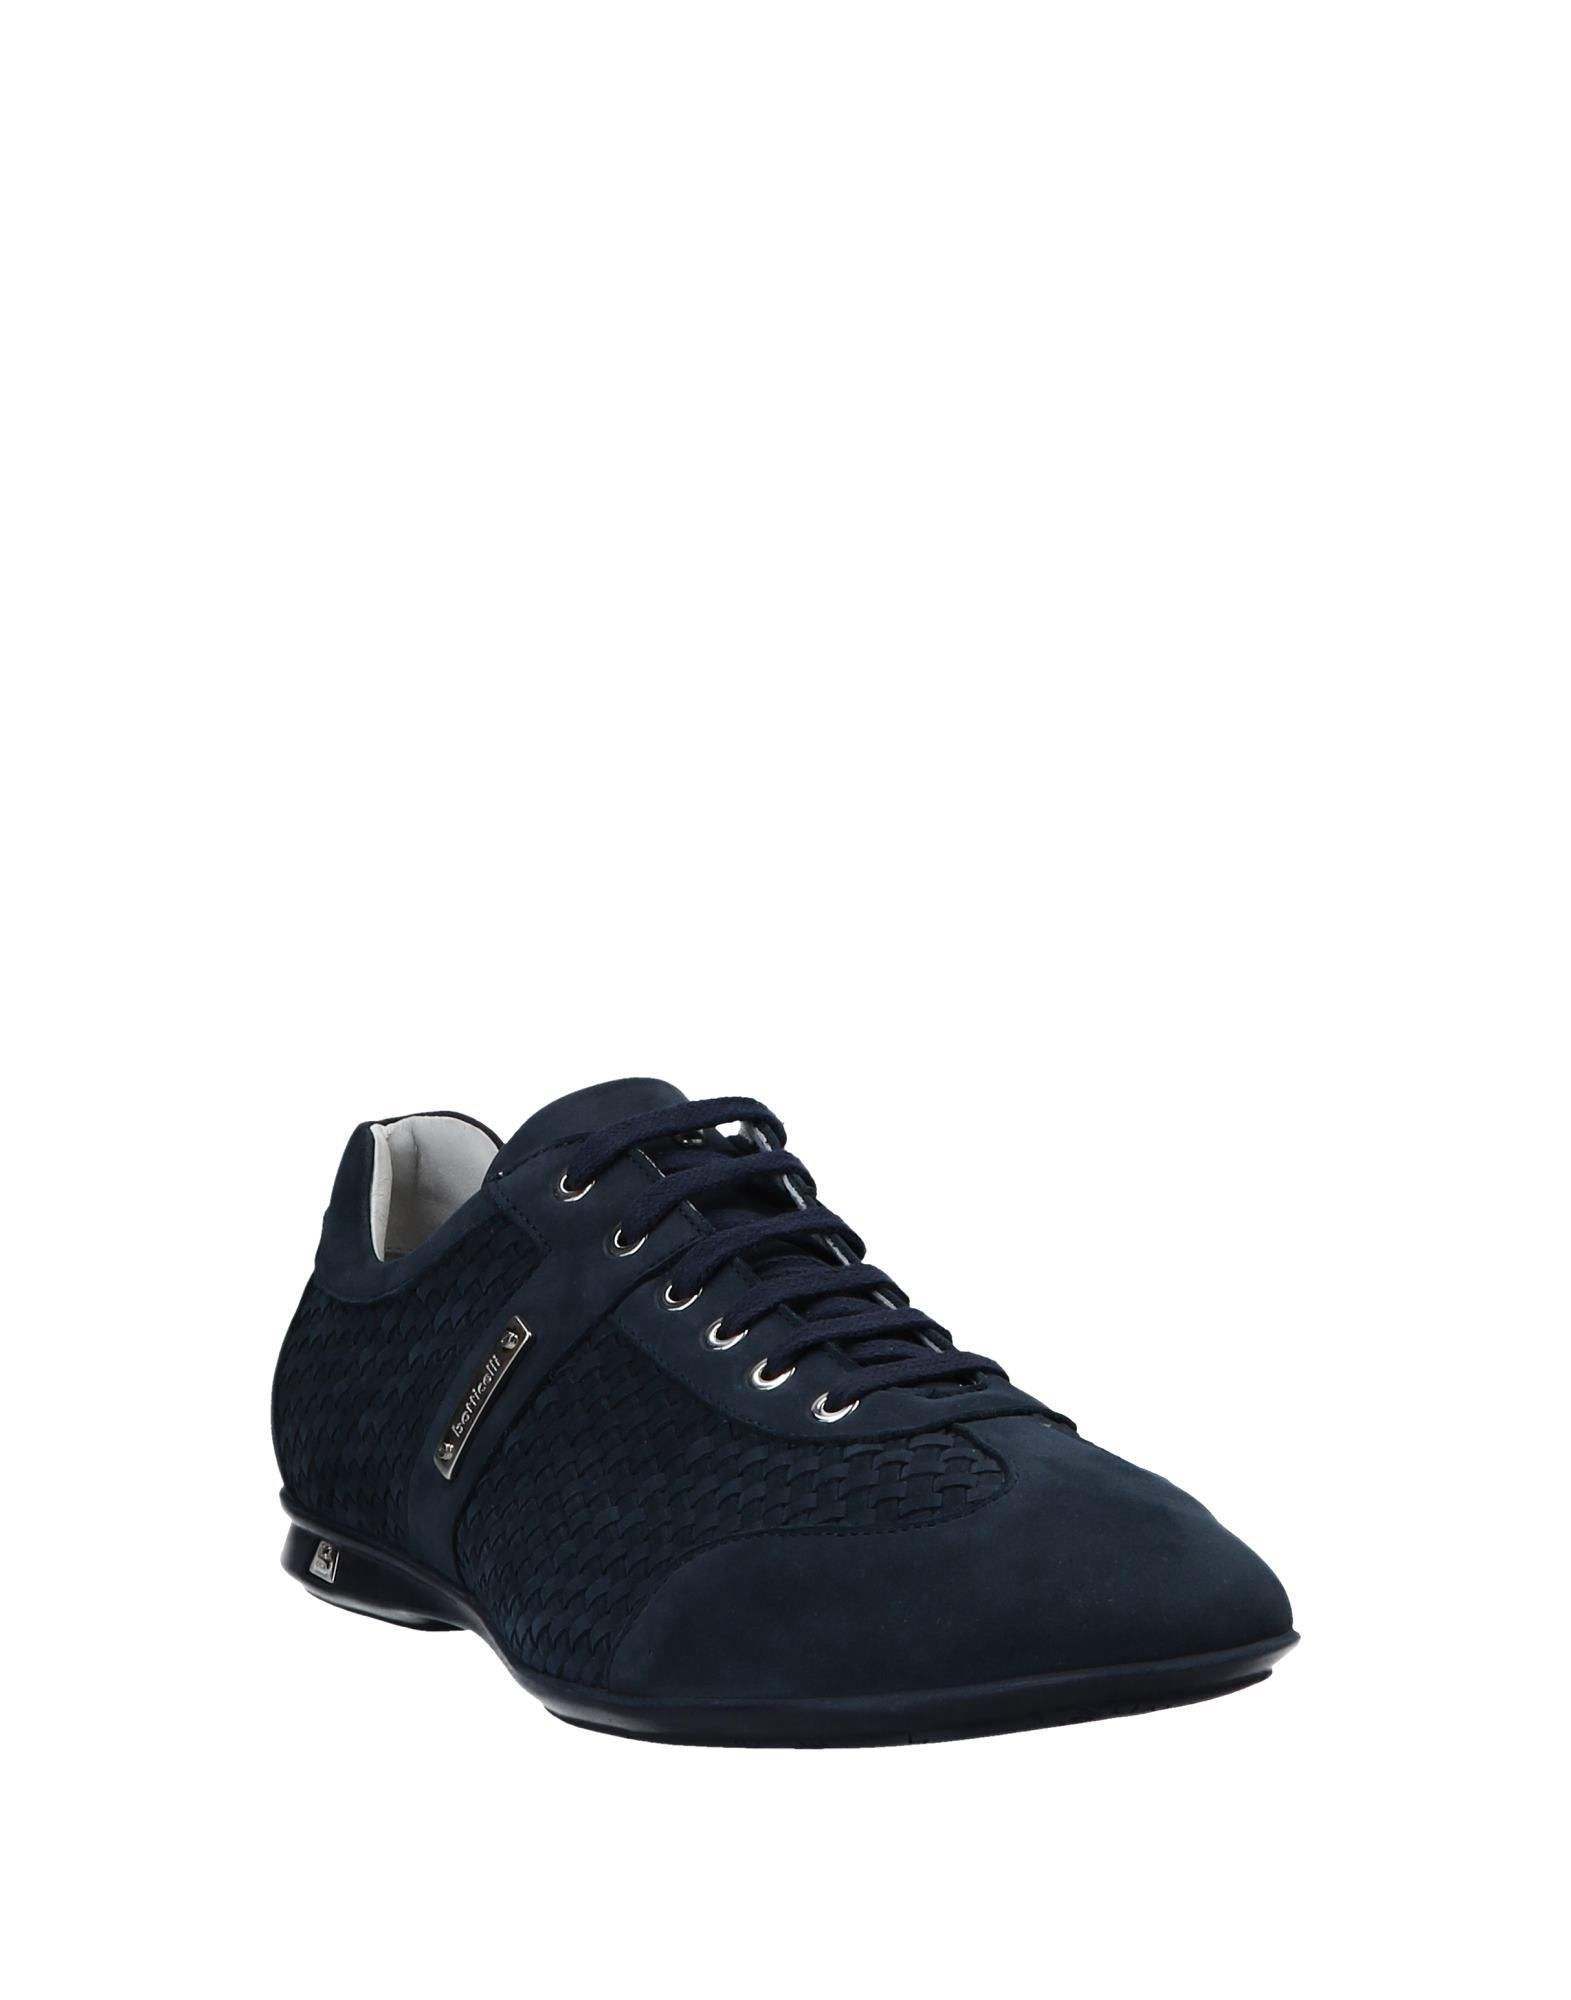 Roberto Botticelli Botticelli Roberto Sneakers Herren  11554329LM Gute Qualität beliebte Schuhe 44fa8c